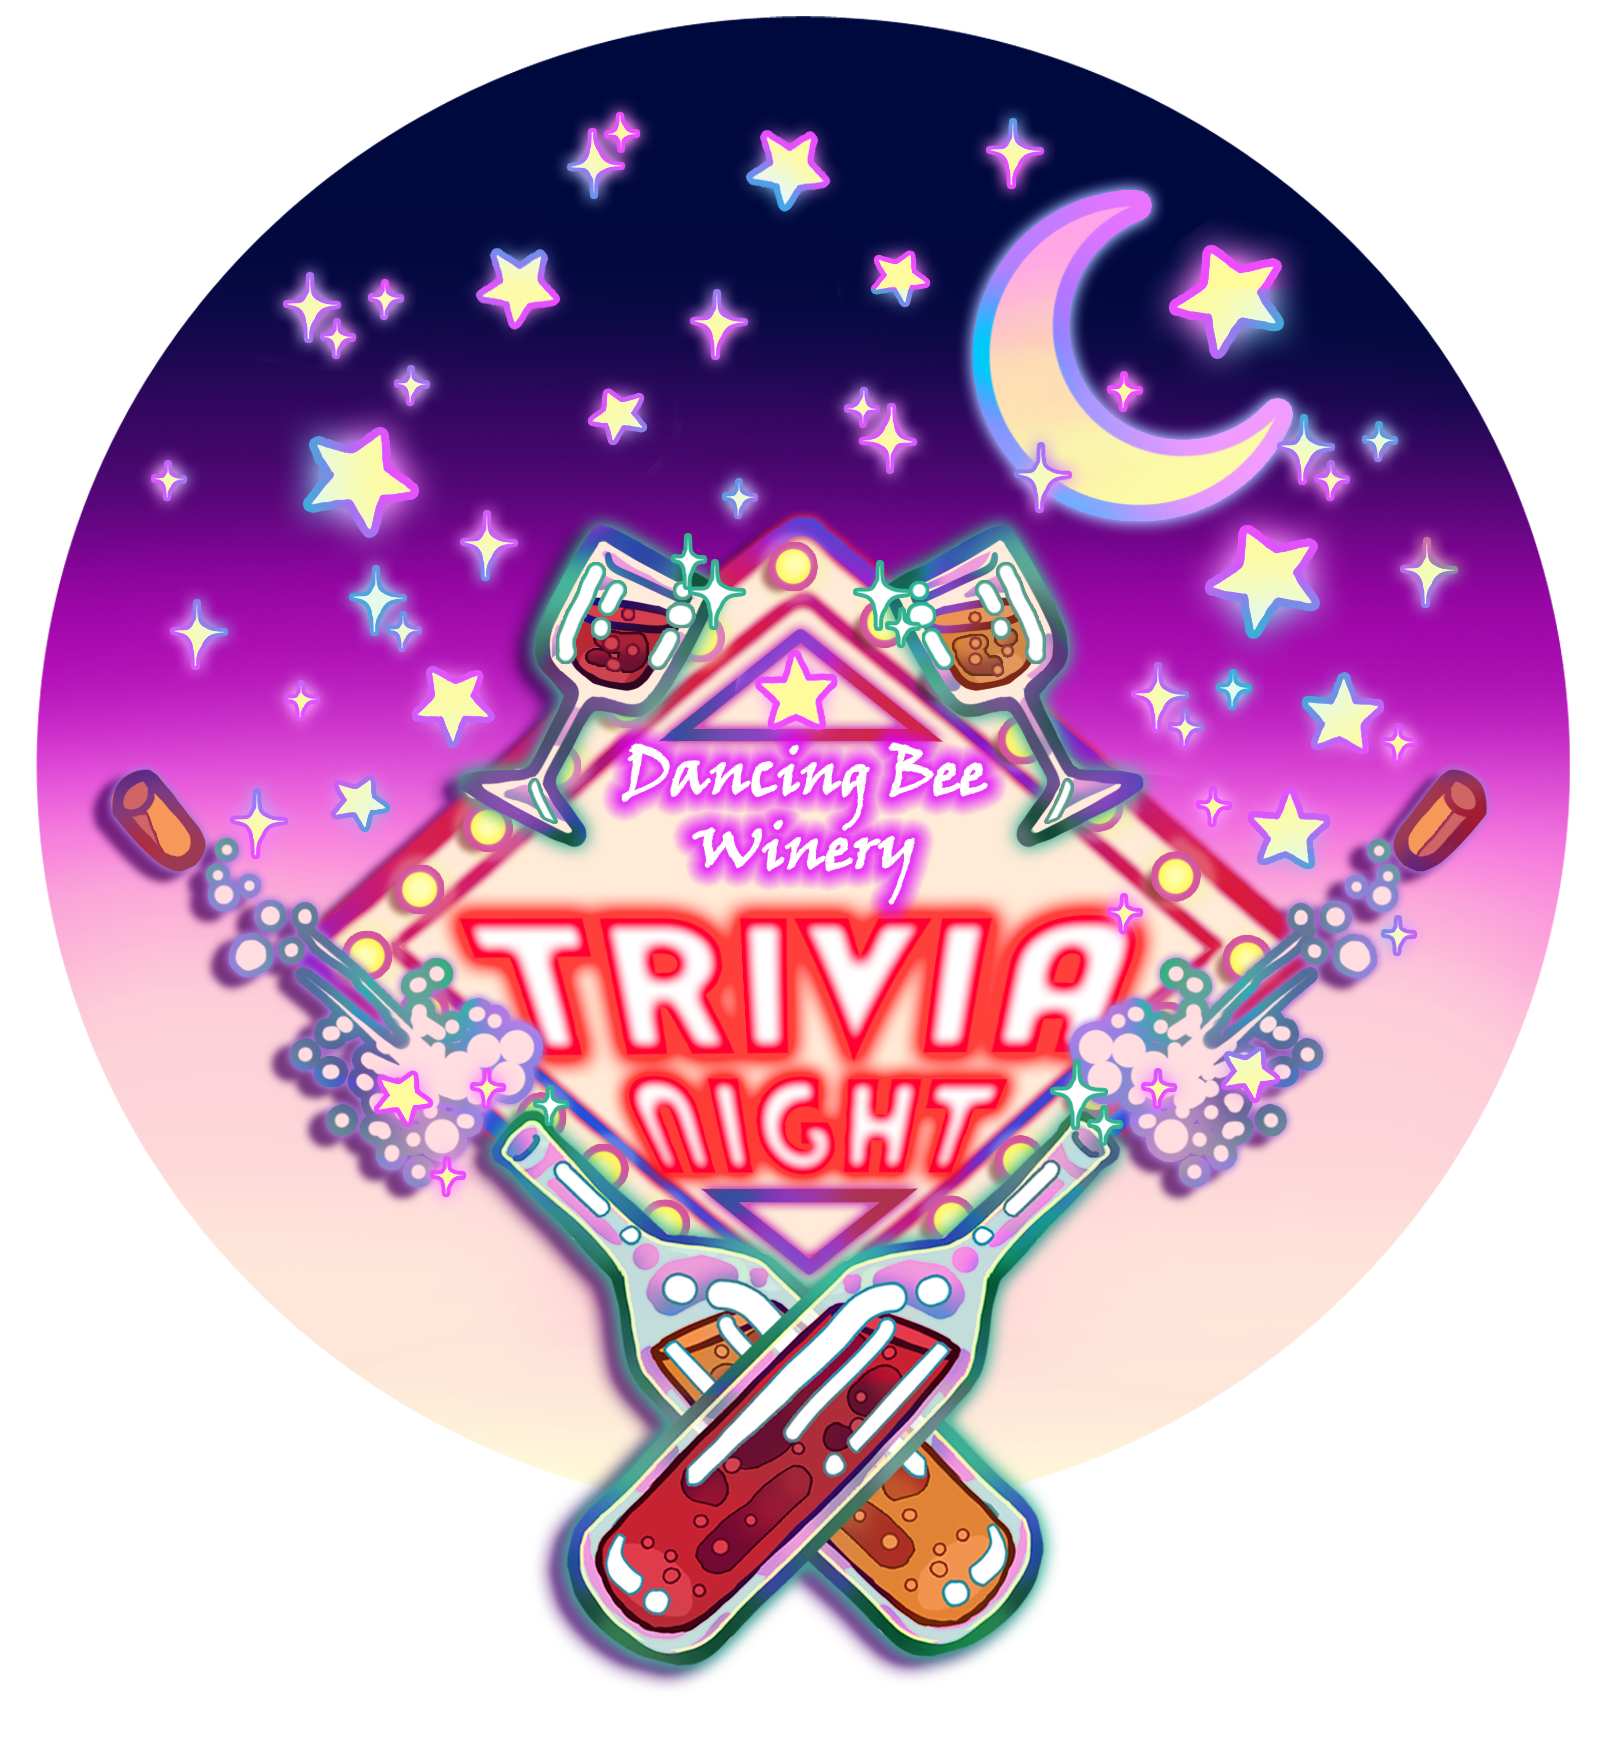 trivia-night16nightversion-circle.png